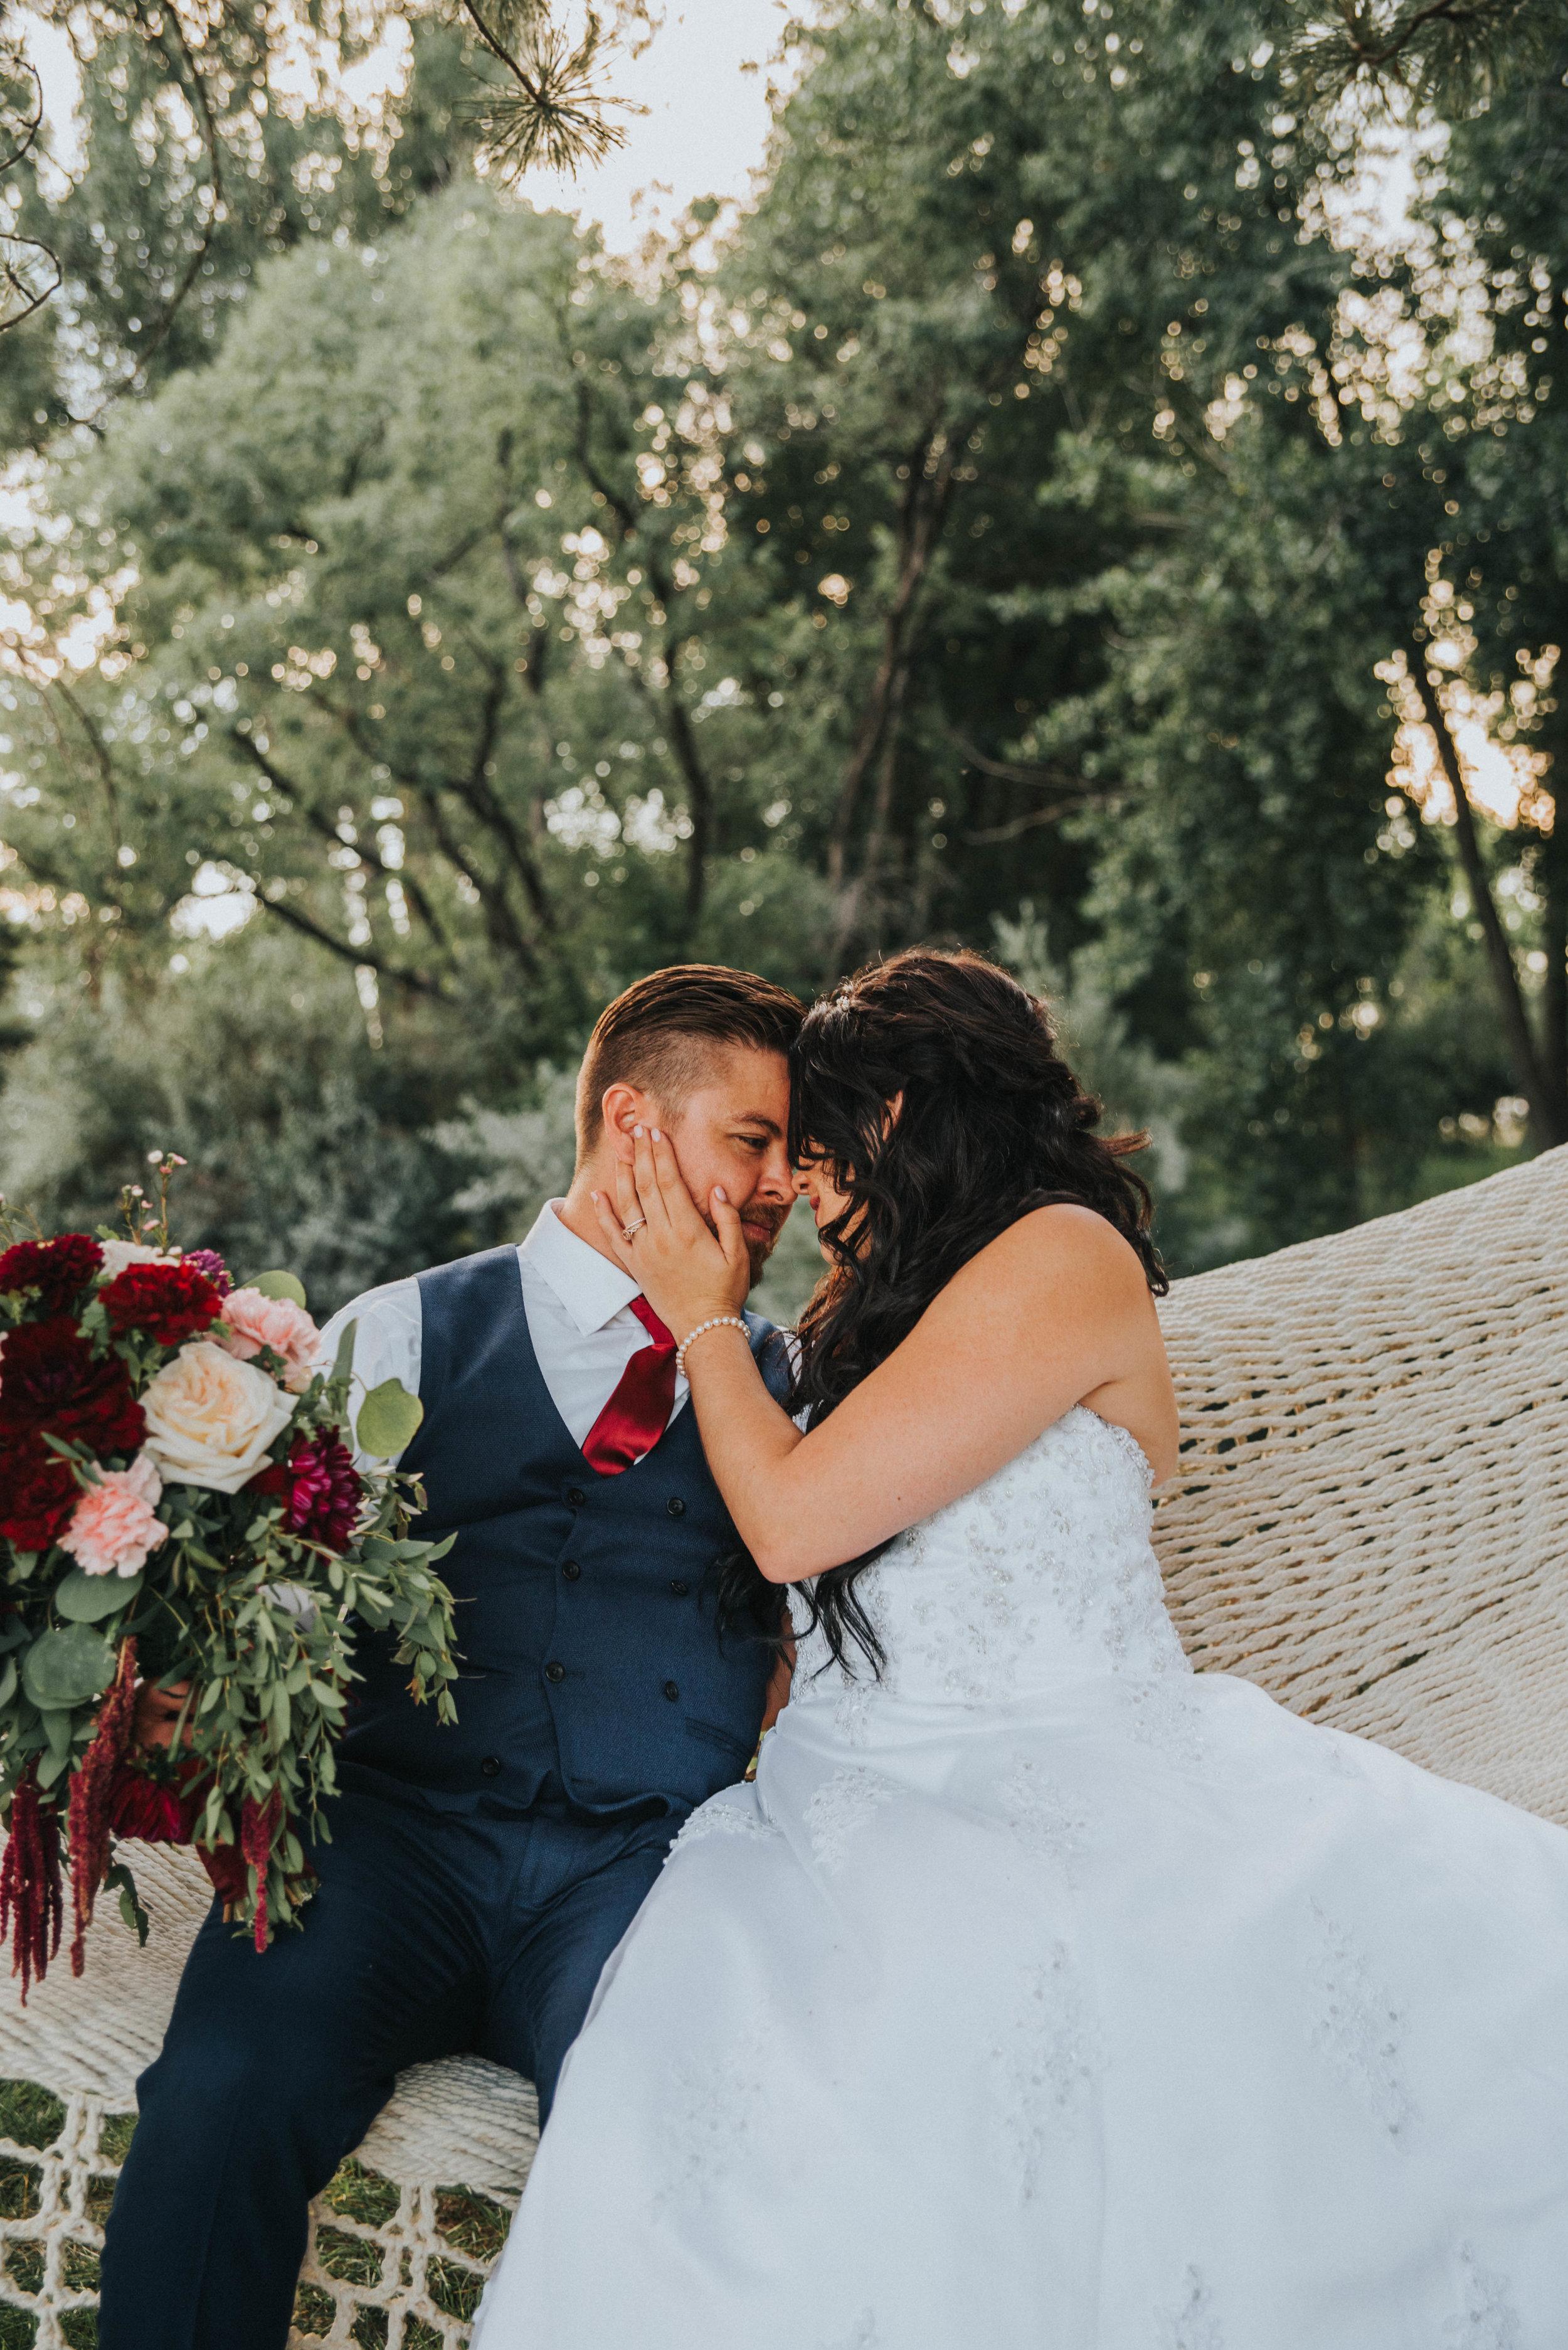 Colorado Wedding Photographer | Miss. Miller's Photography